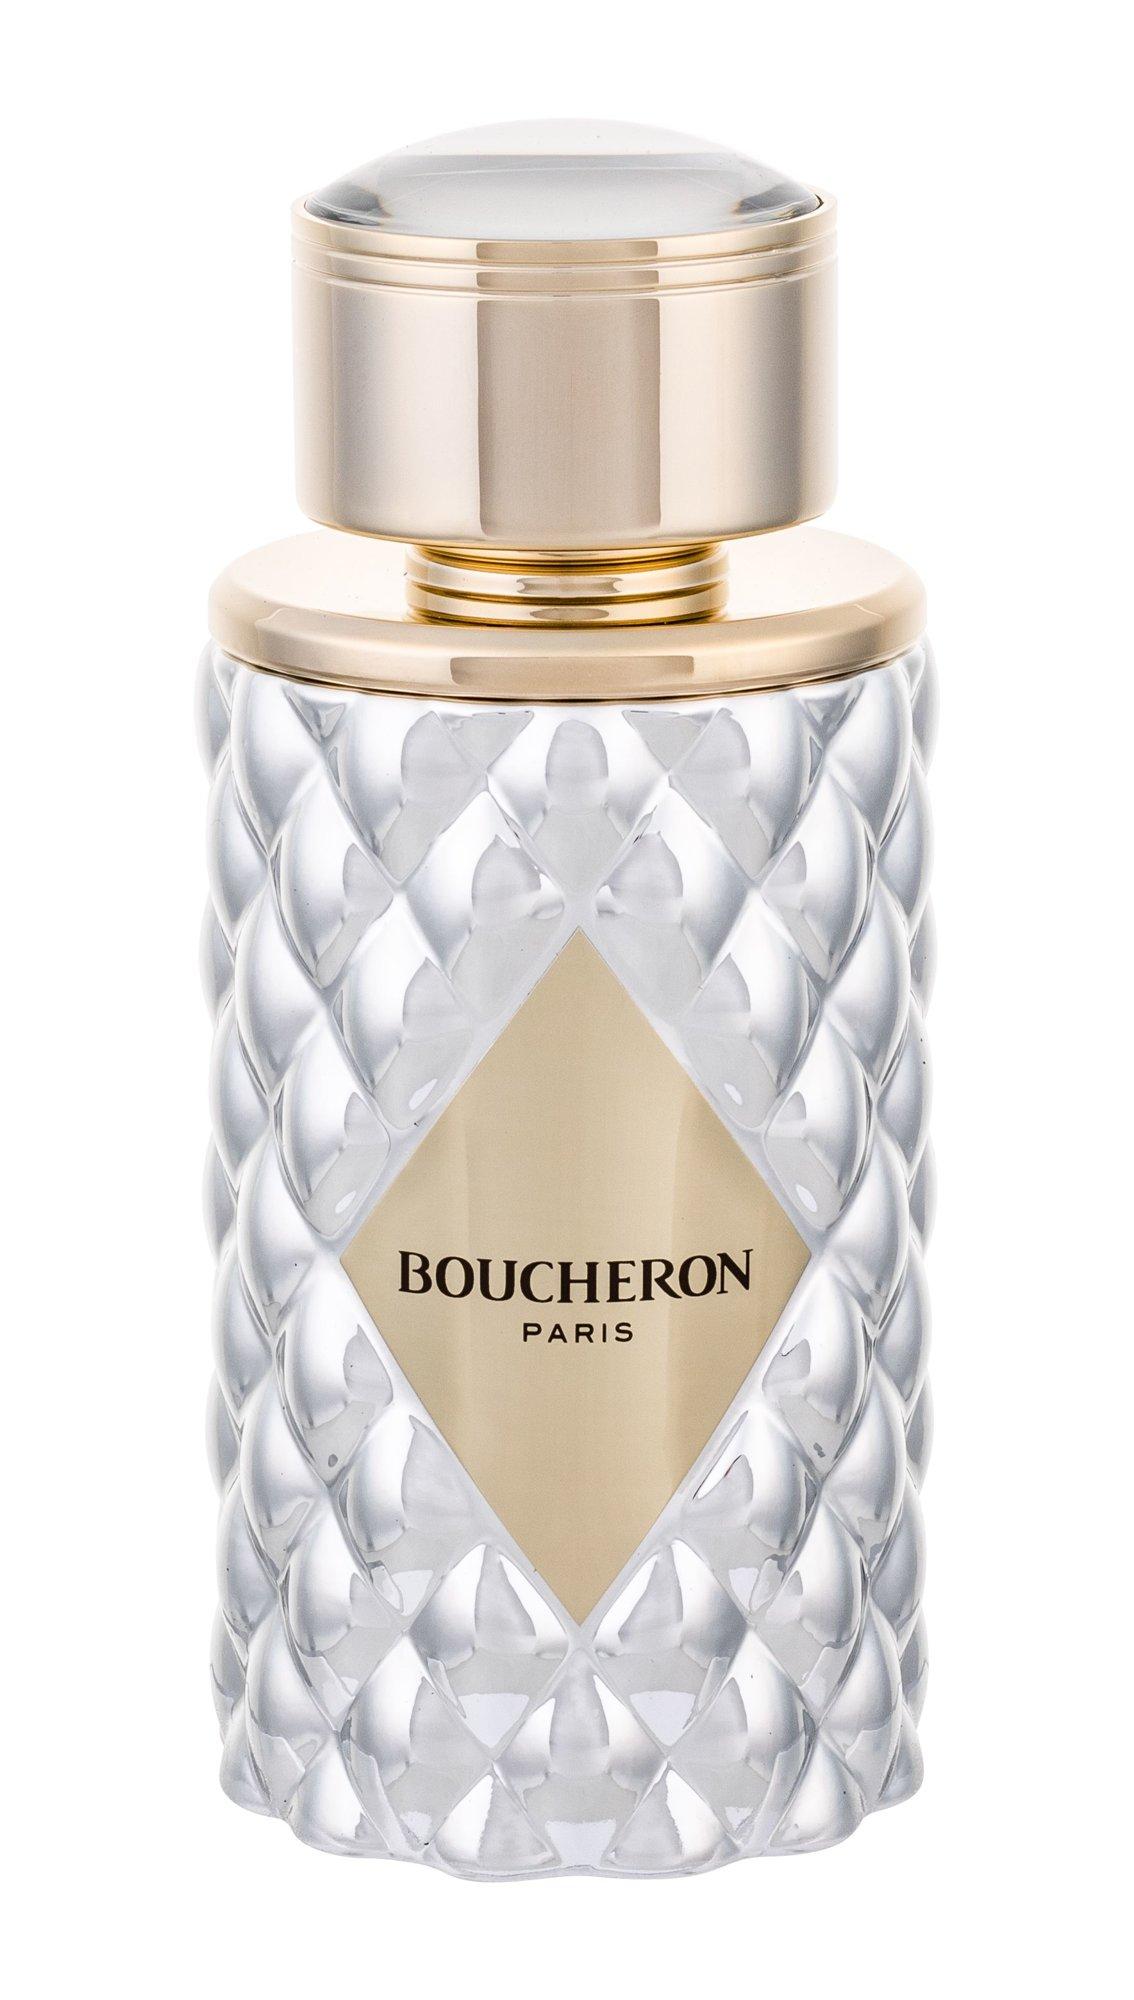 Boucheron Place Vendome White Gold EDP 100ml